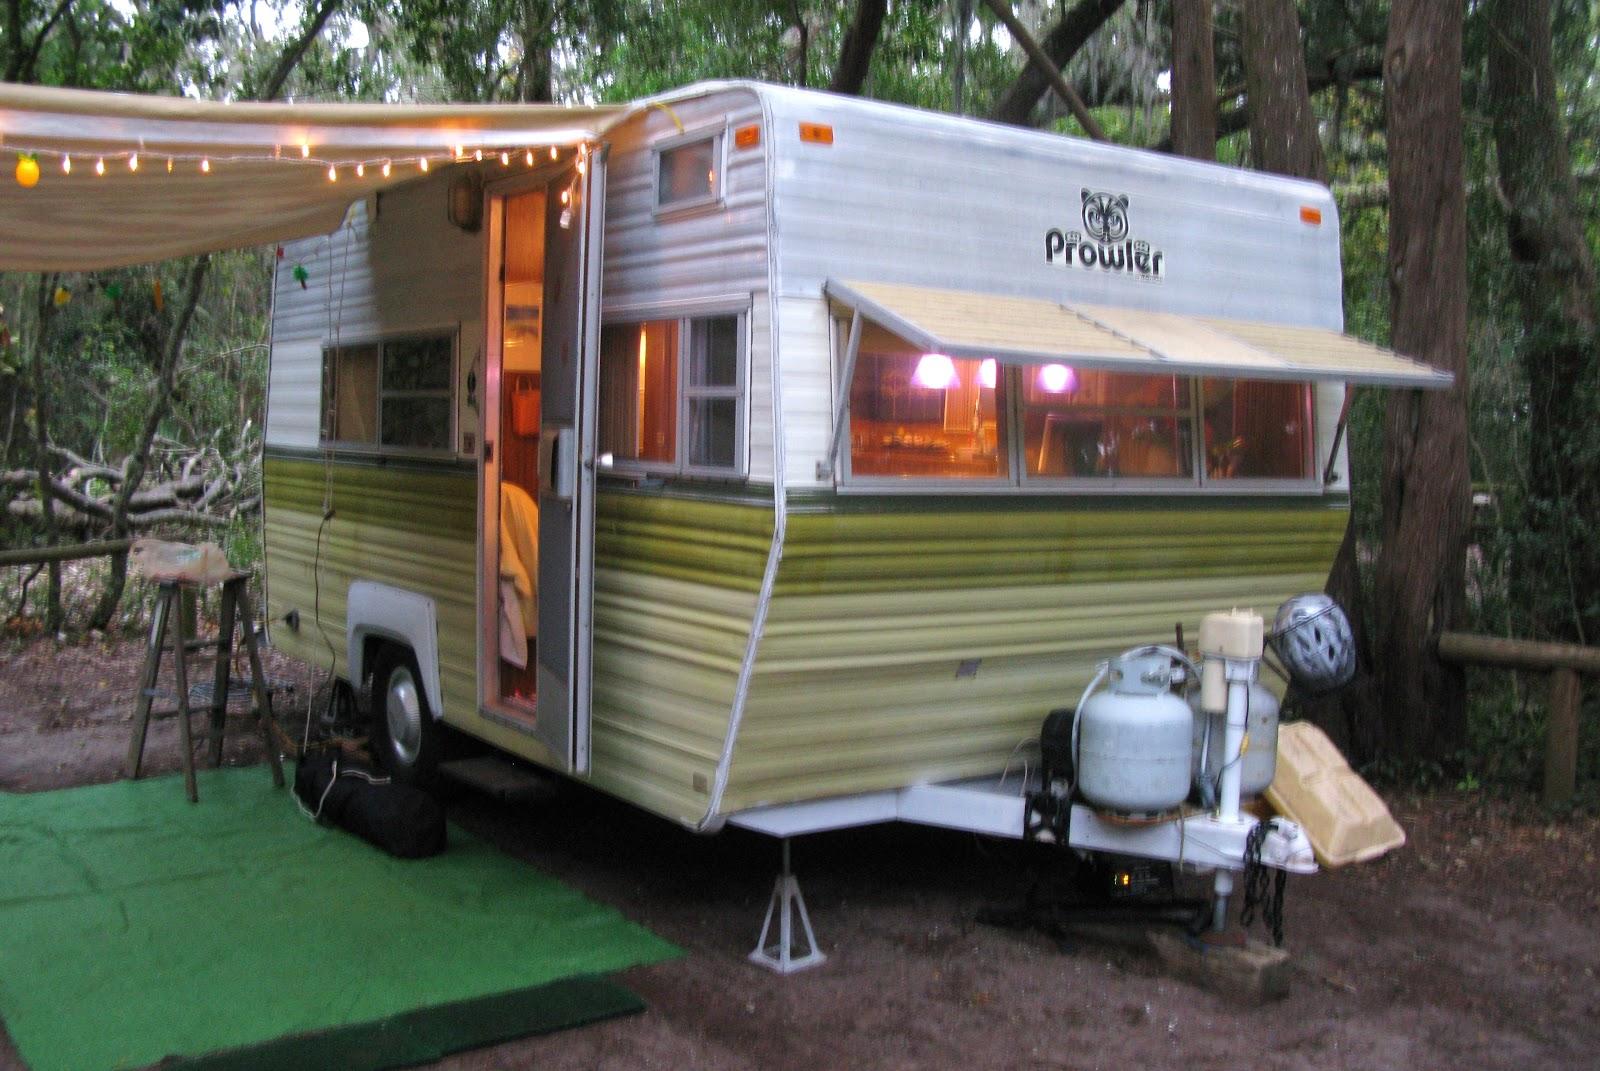 1970 Prowler Travel Trailer Camper Autos Post